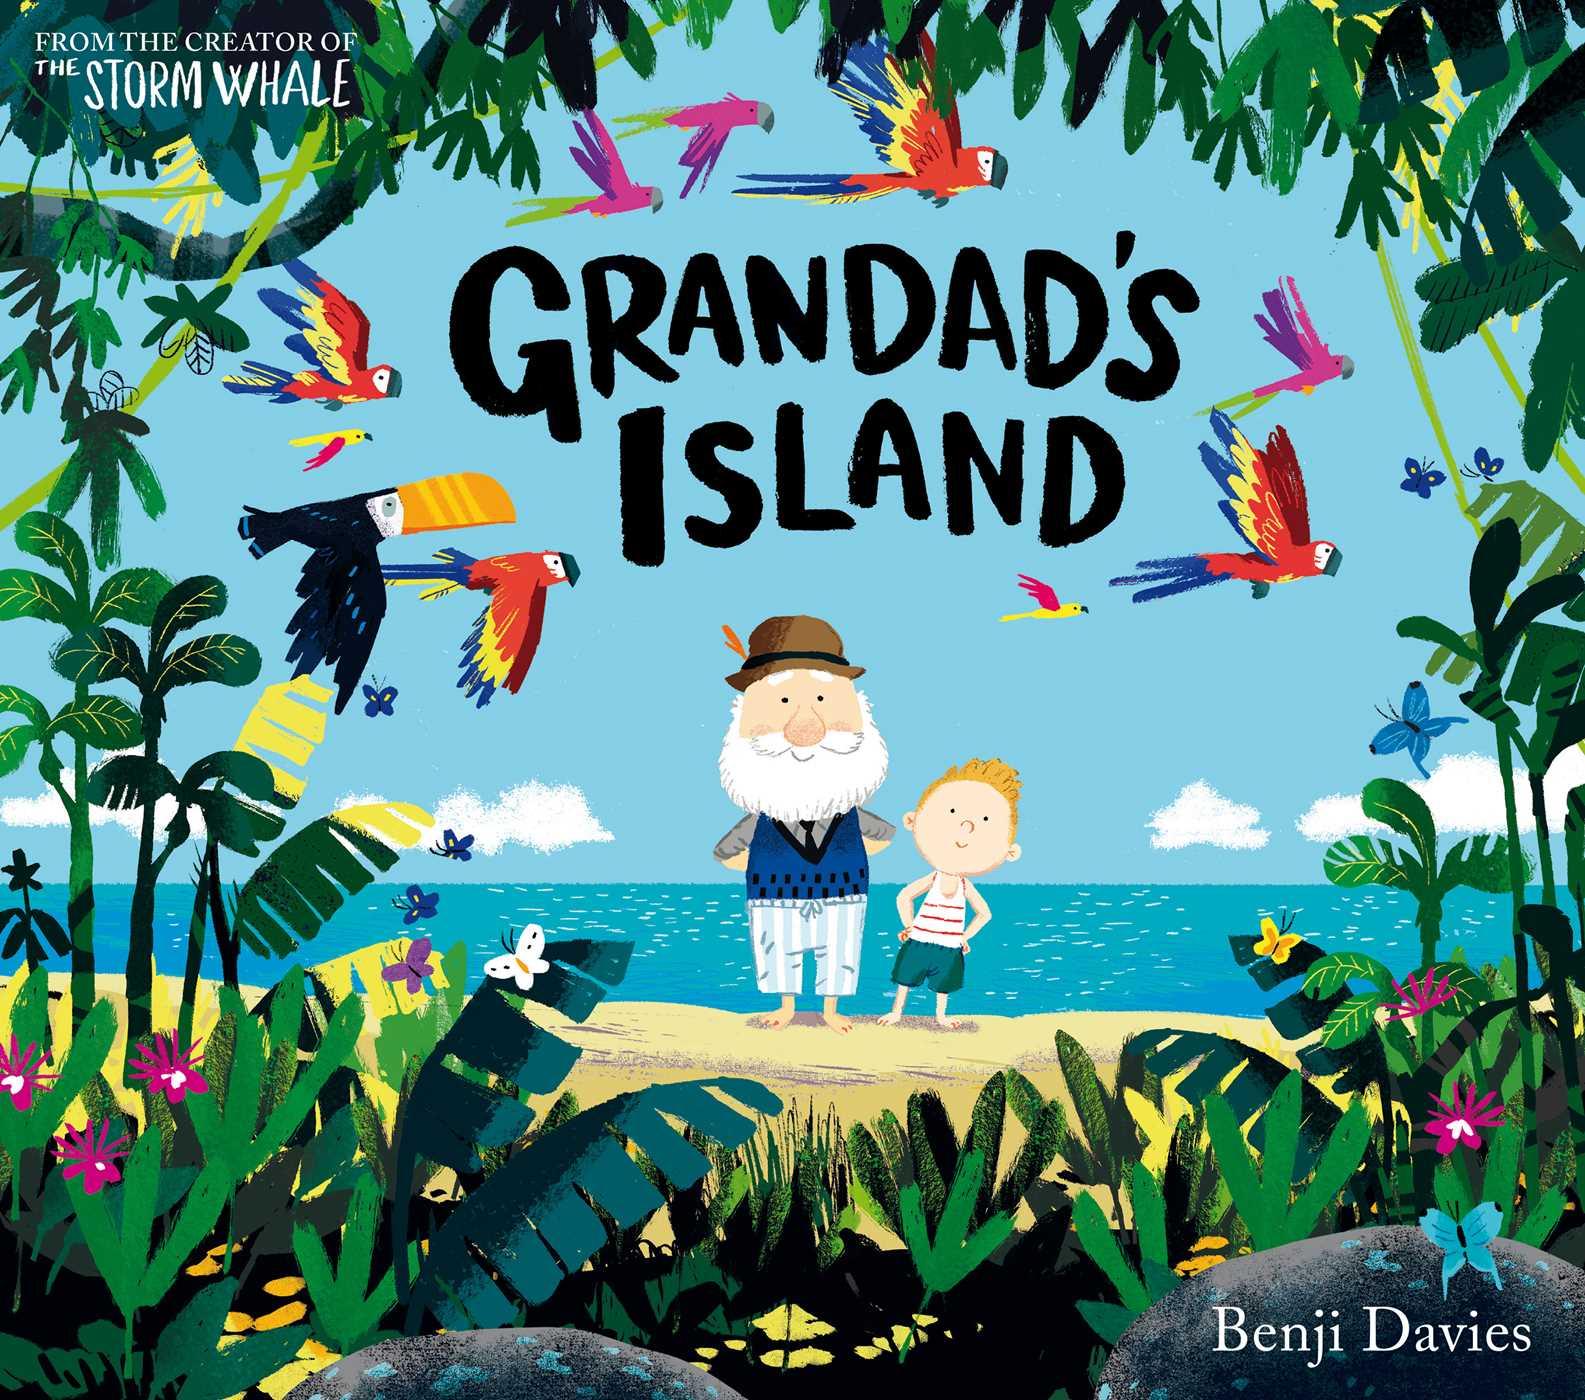 Grandads island 9781471119958 hr